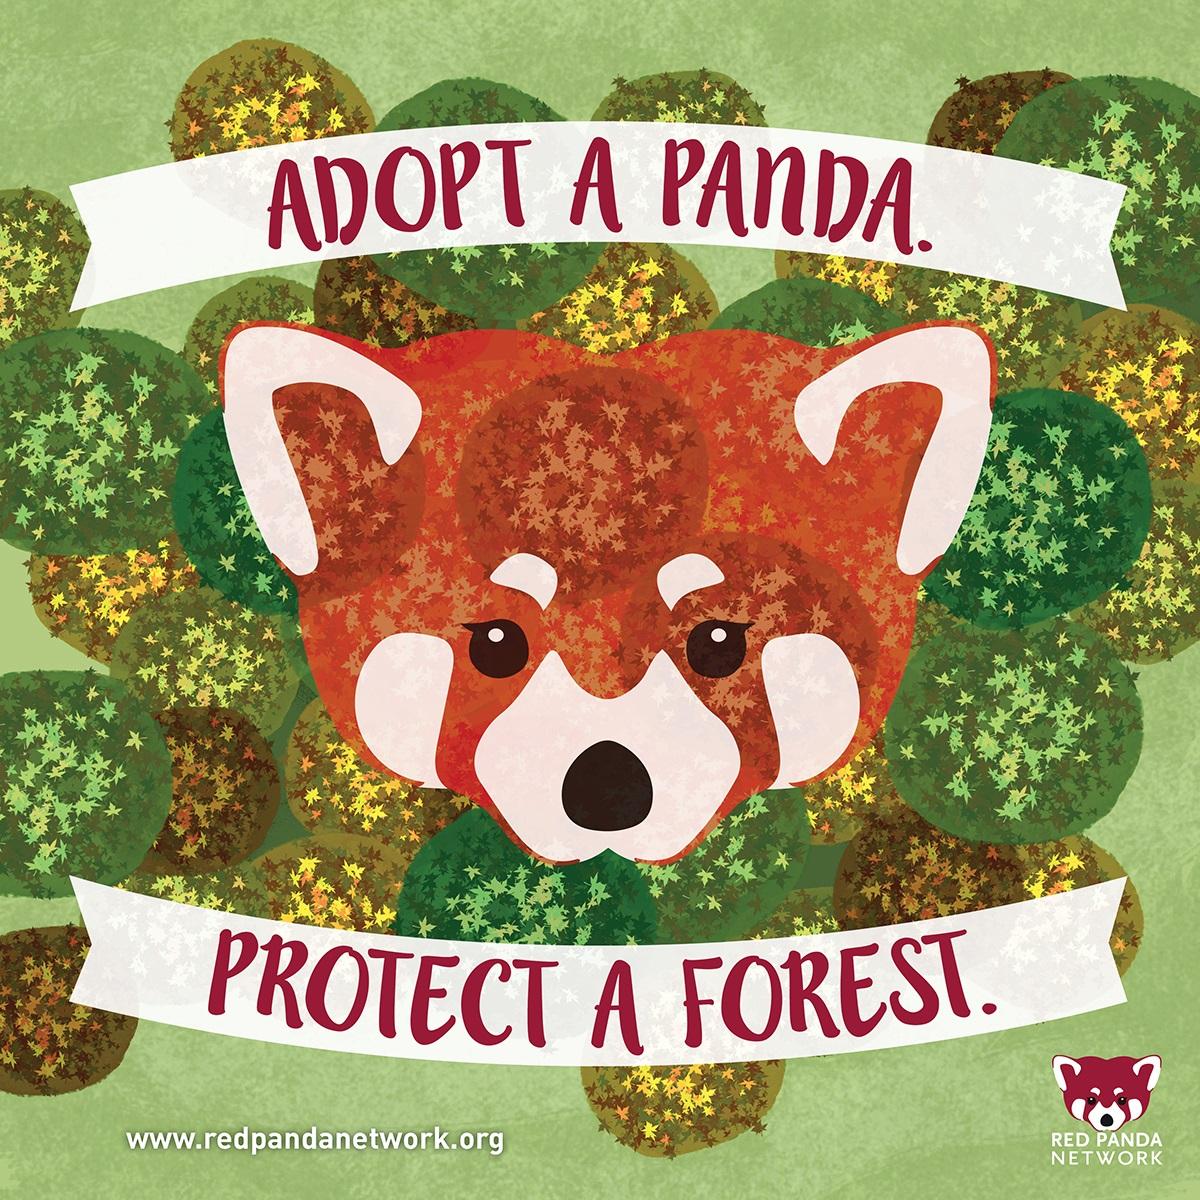 Drawn red panda its habitat Panda Network red Results kids